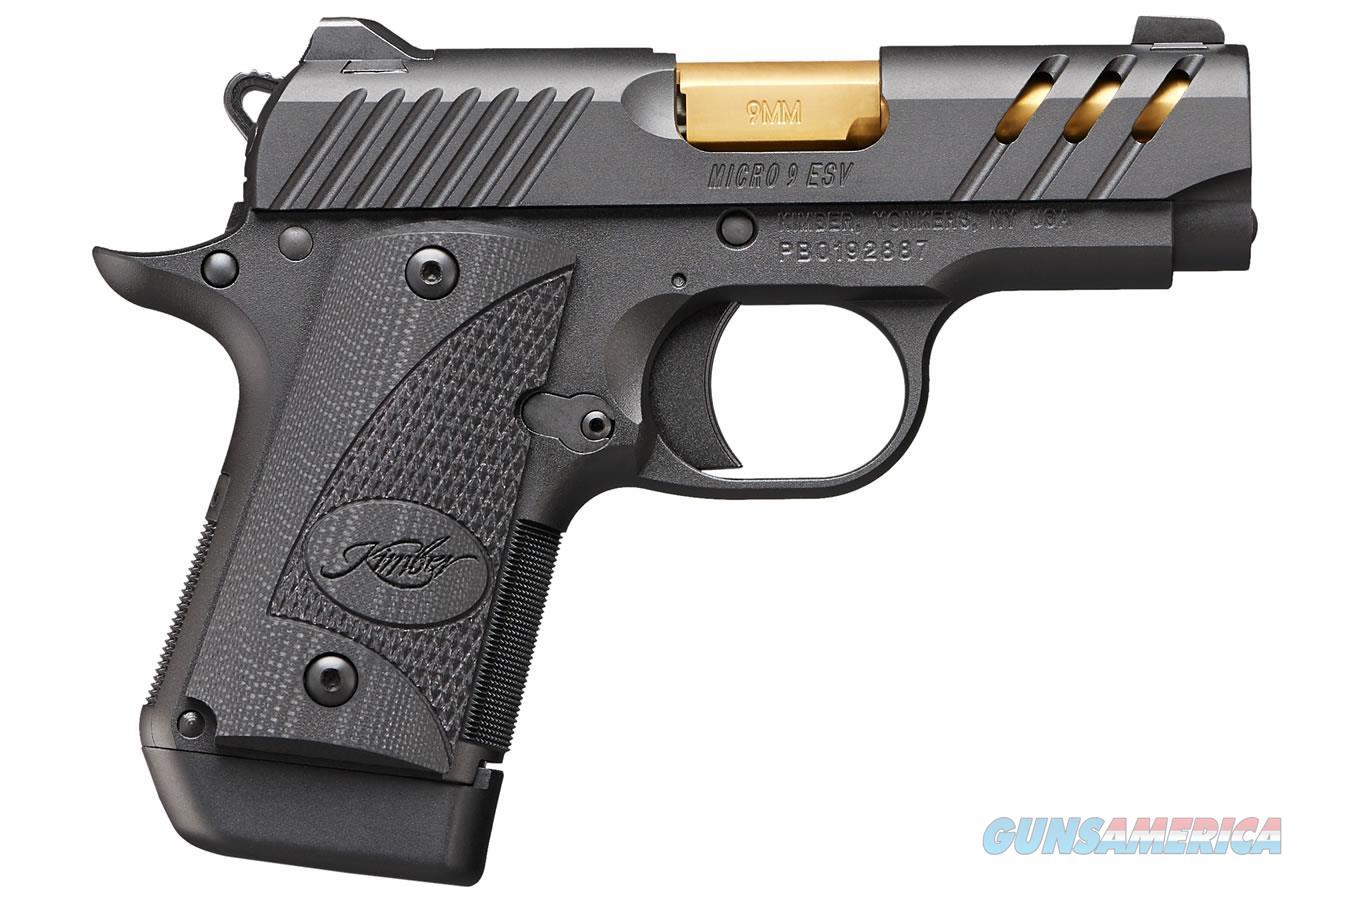 "Kimber Micro 9 ESV Black 9mm 3.15"" Gold 3300199   Guns > Pistols > Kimber of America Pistols > Micro 9"